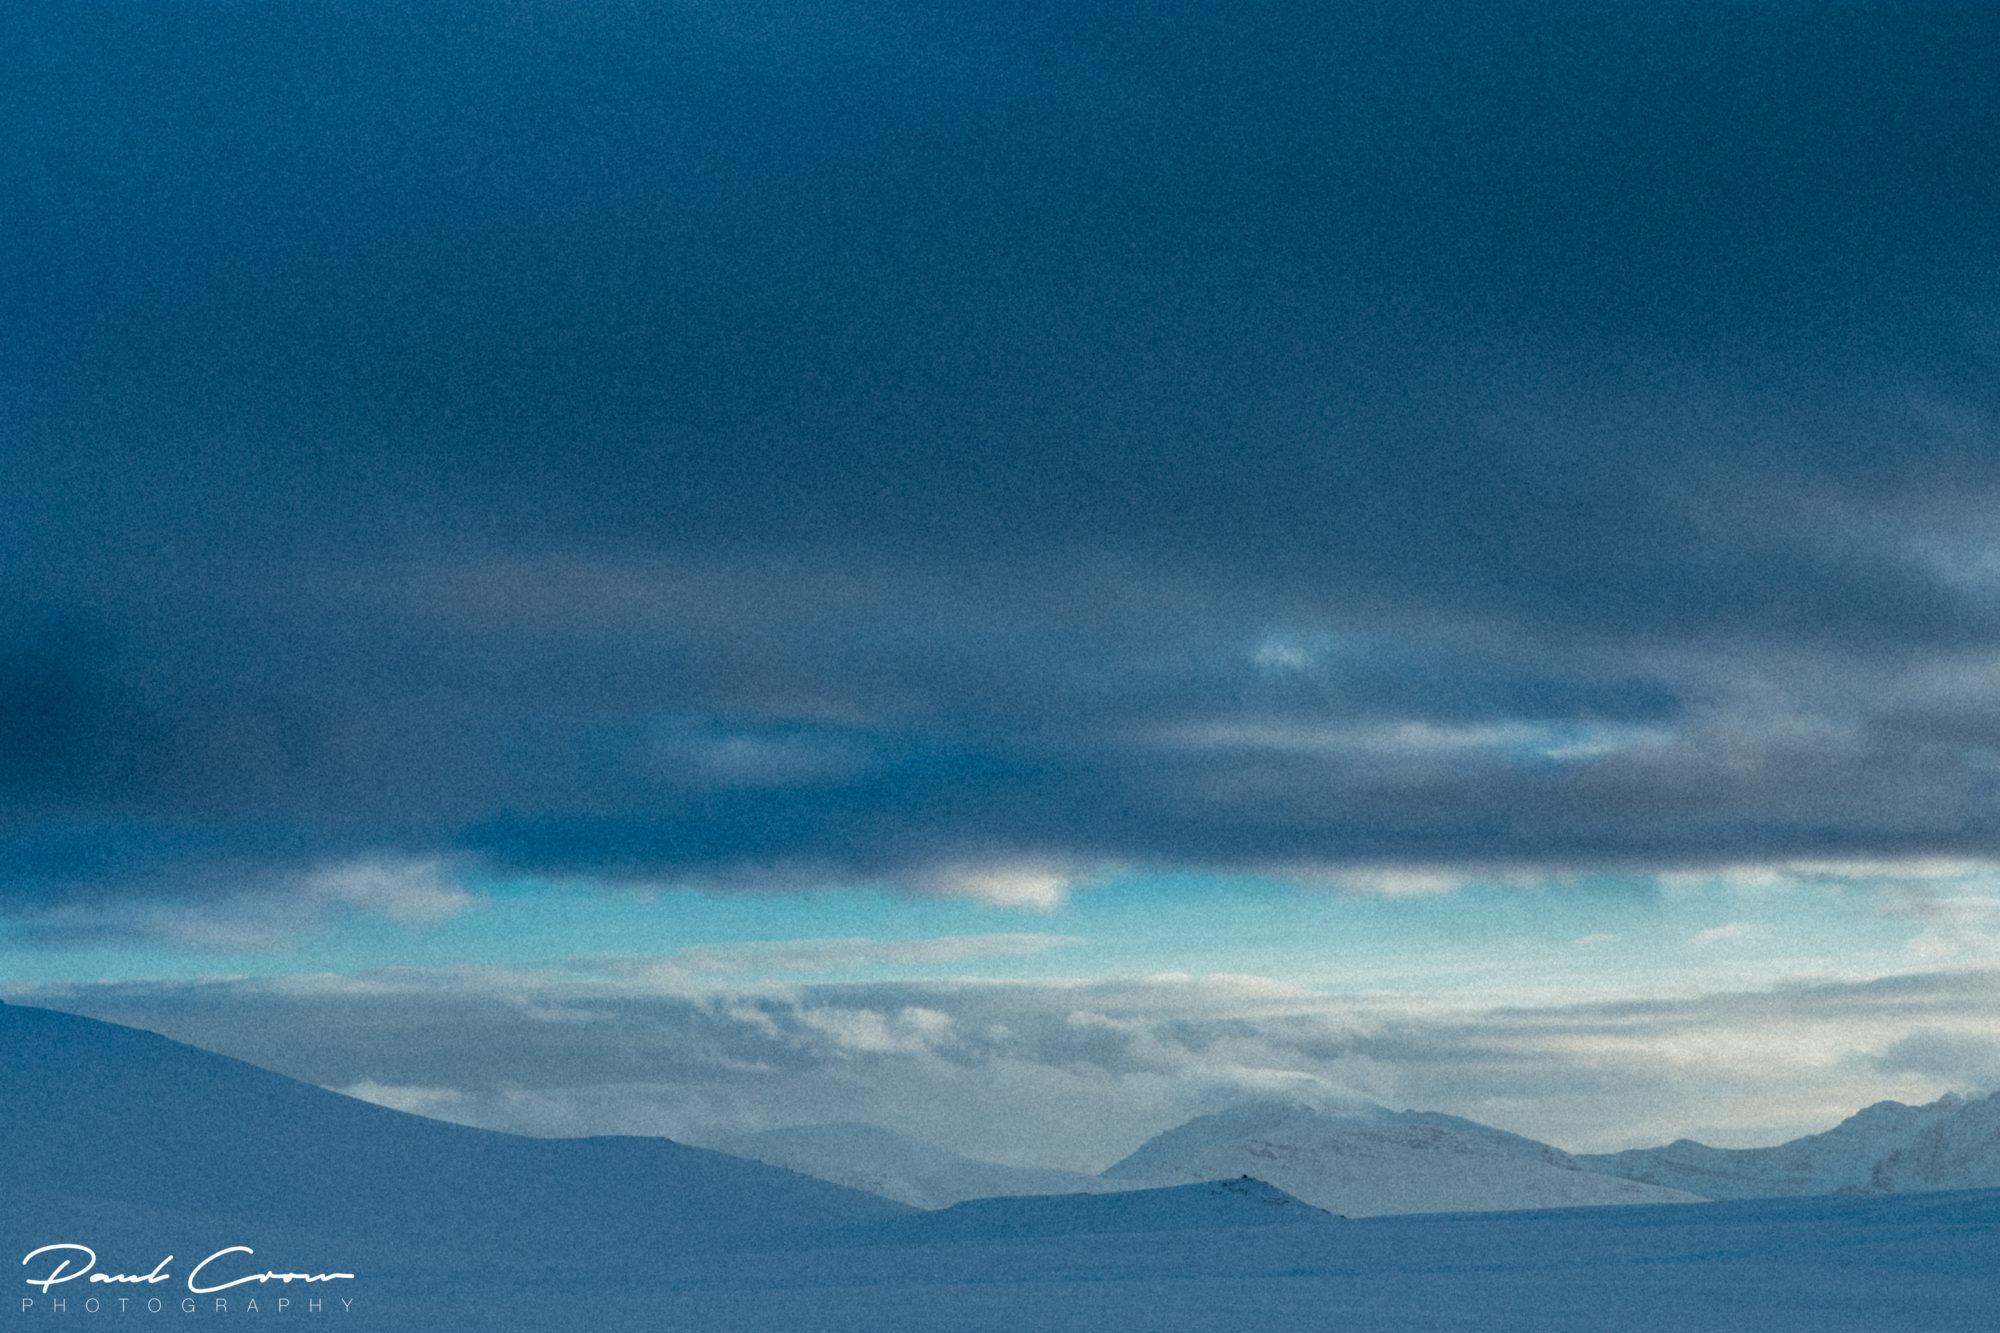 Fjellheisen snowy landscape